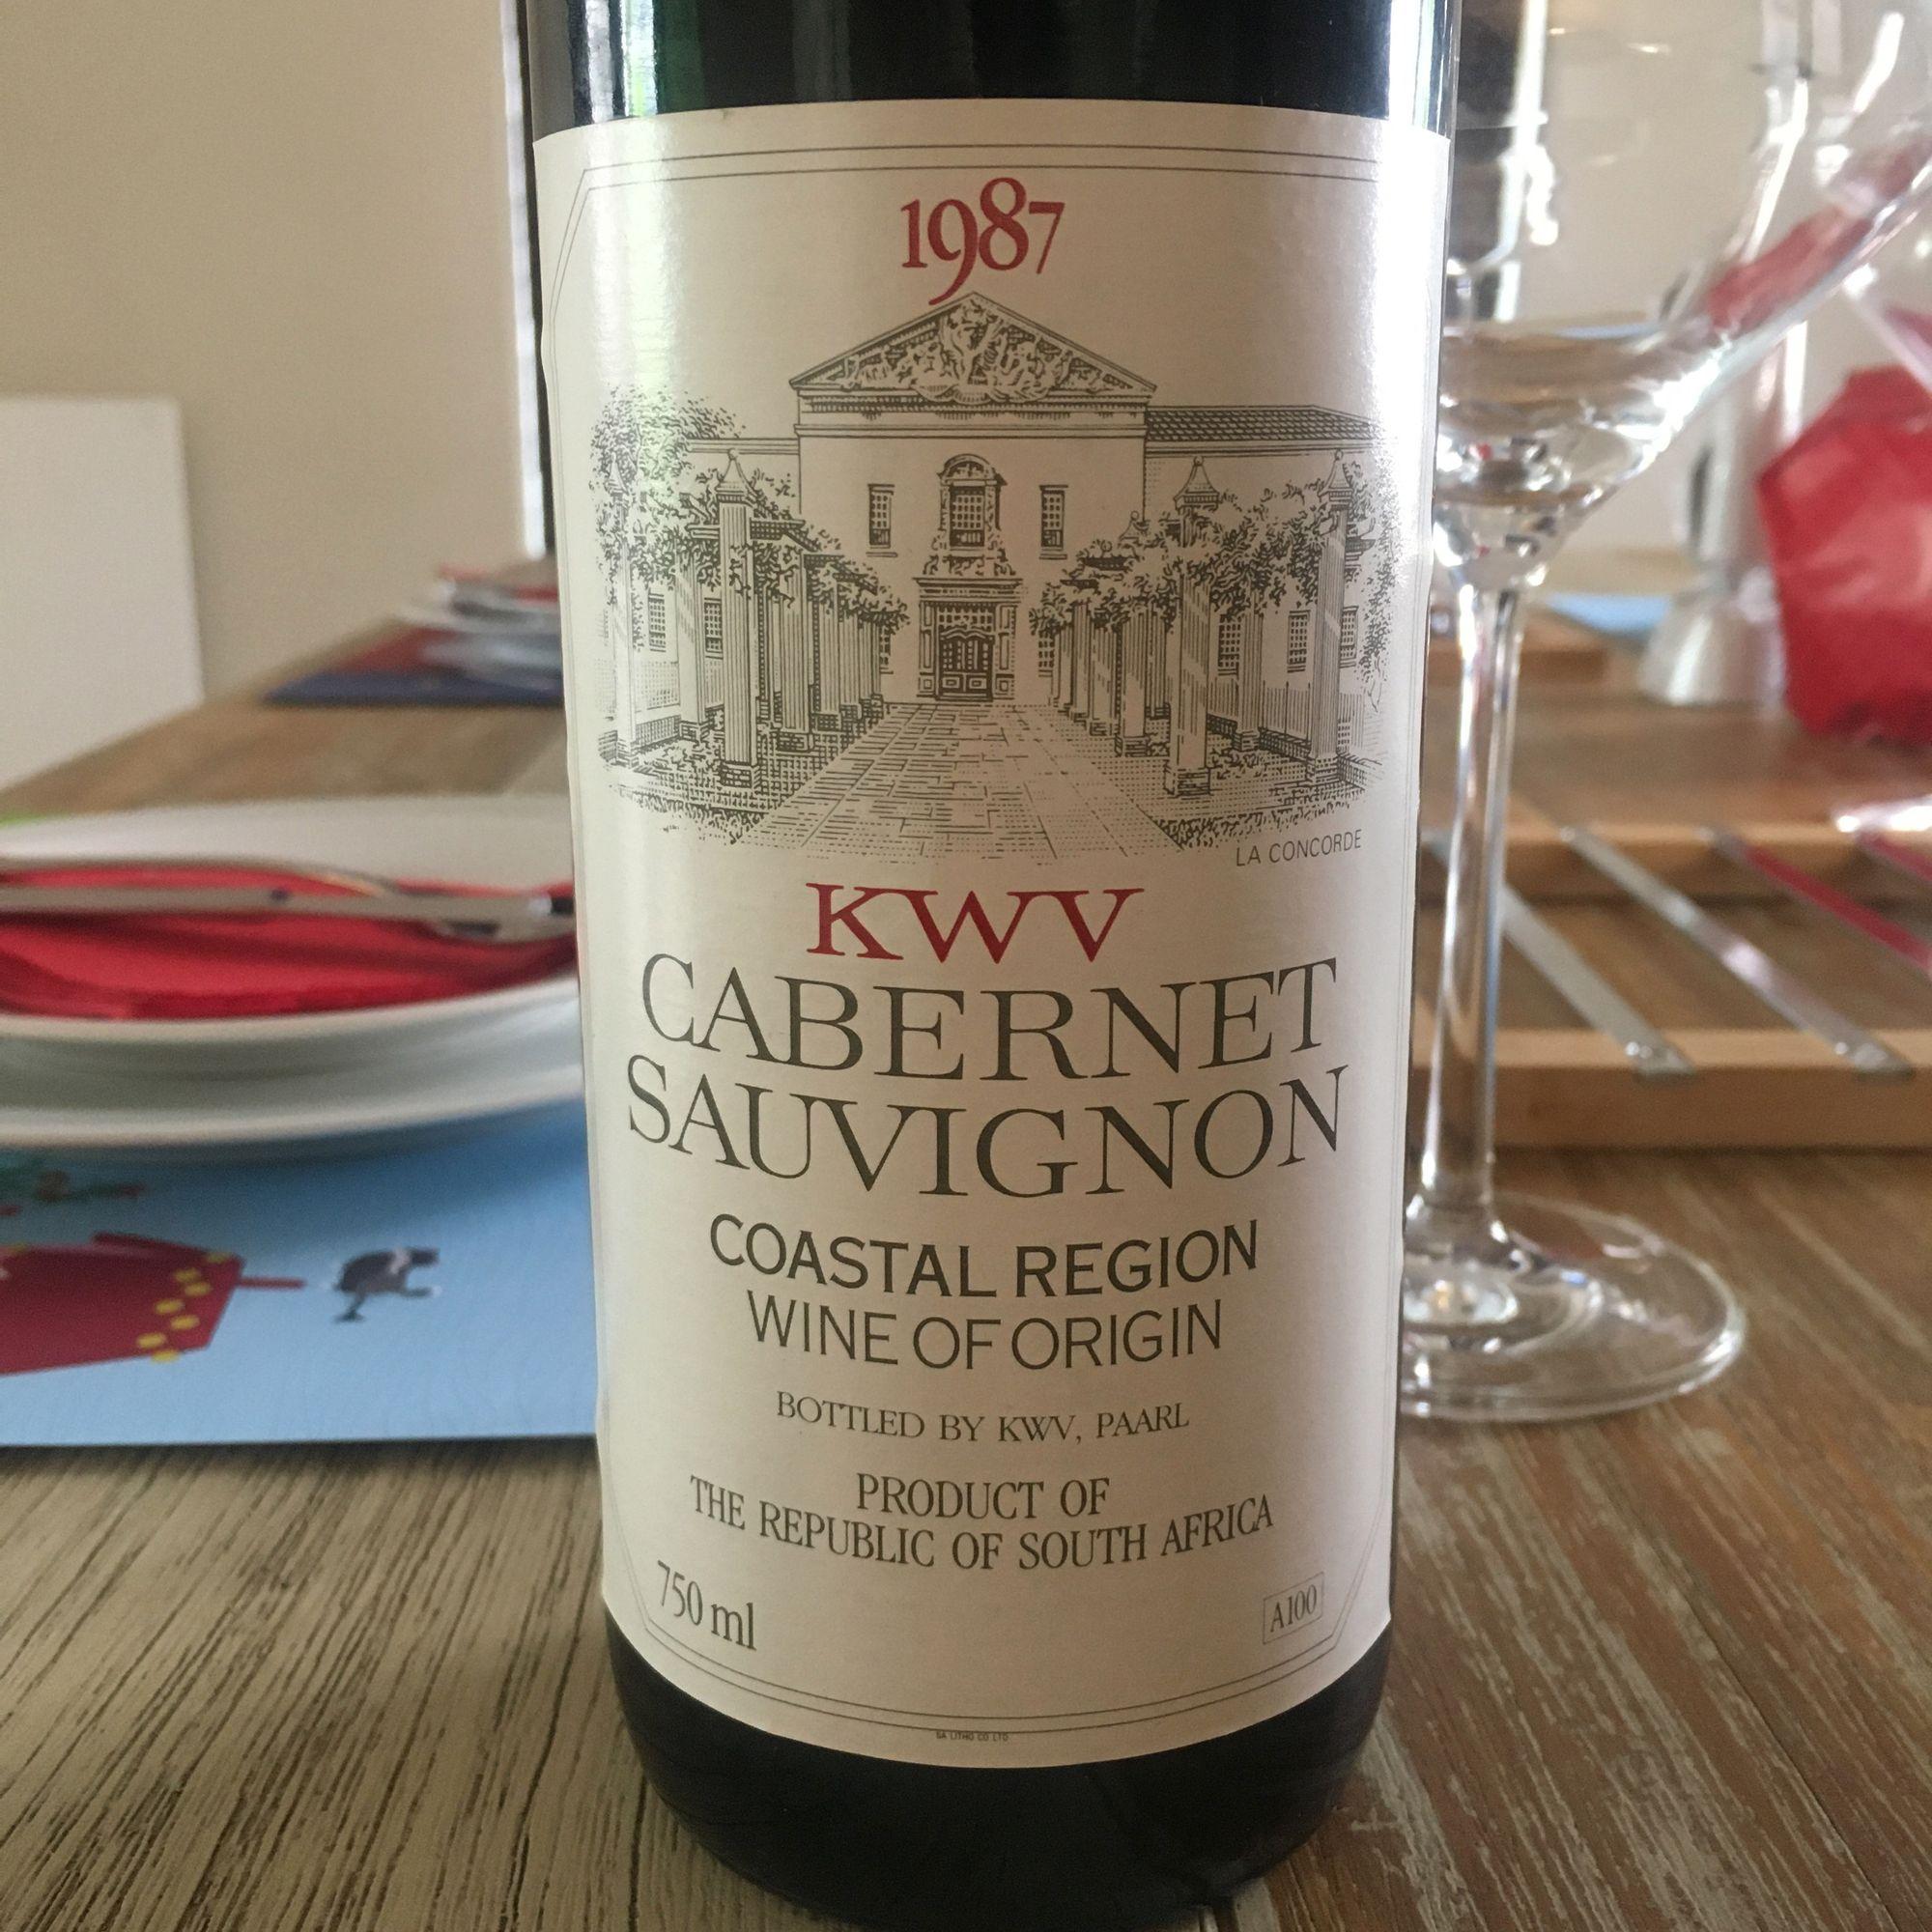 1987 KWV Cabernet Sauvignon enjoyed in 2019